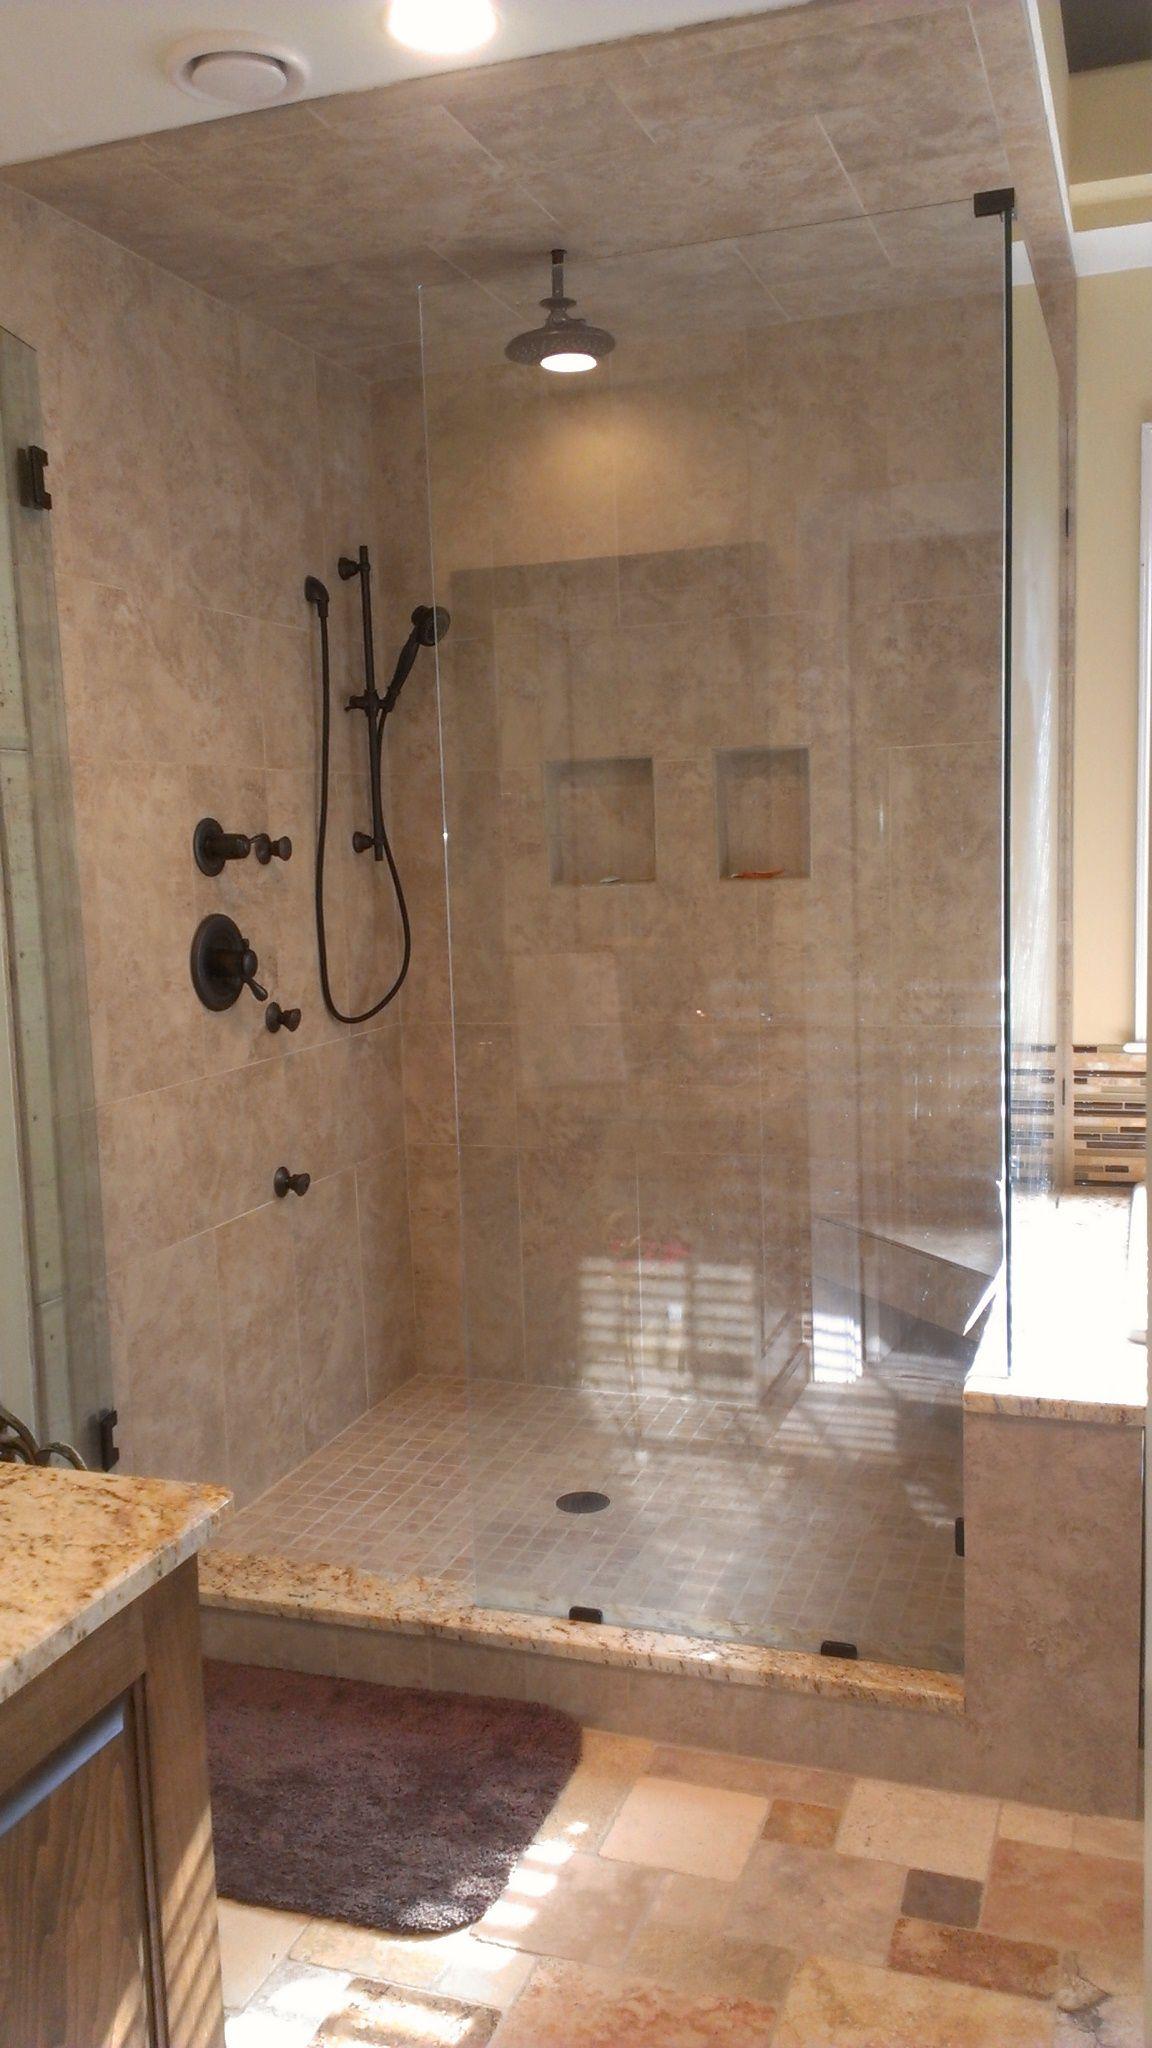 30 Stunning Natural Stone Bathroom Ideas And Pictures Shower Tile Bathroom Tile Diy Tile Remodel